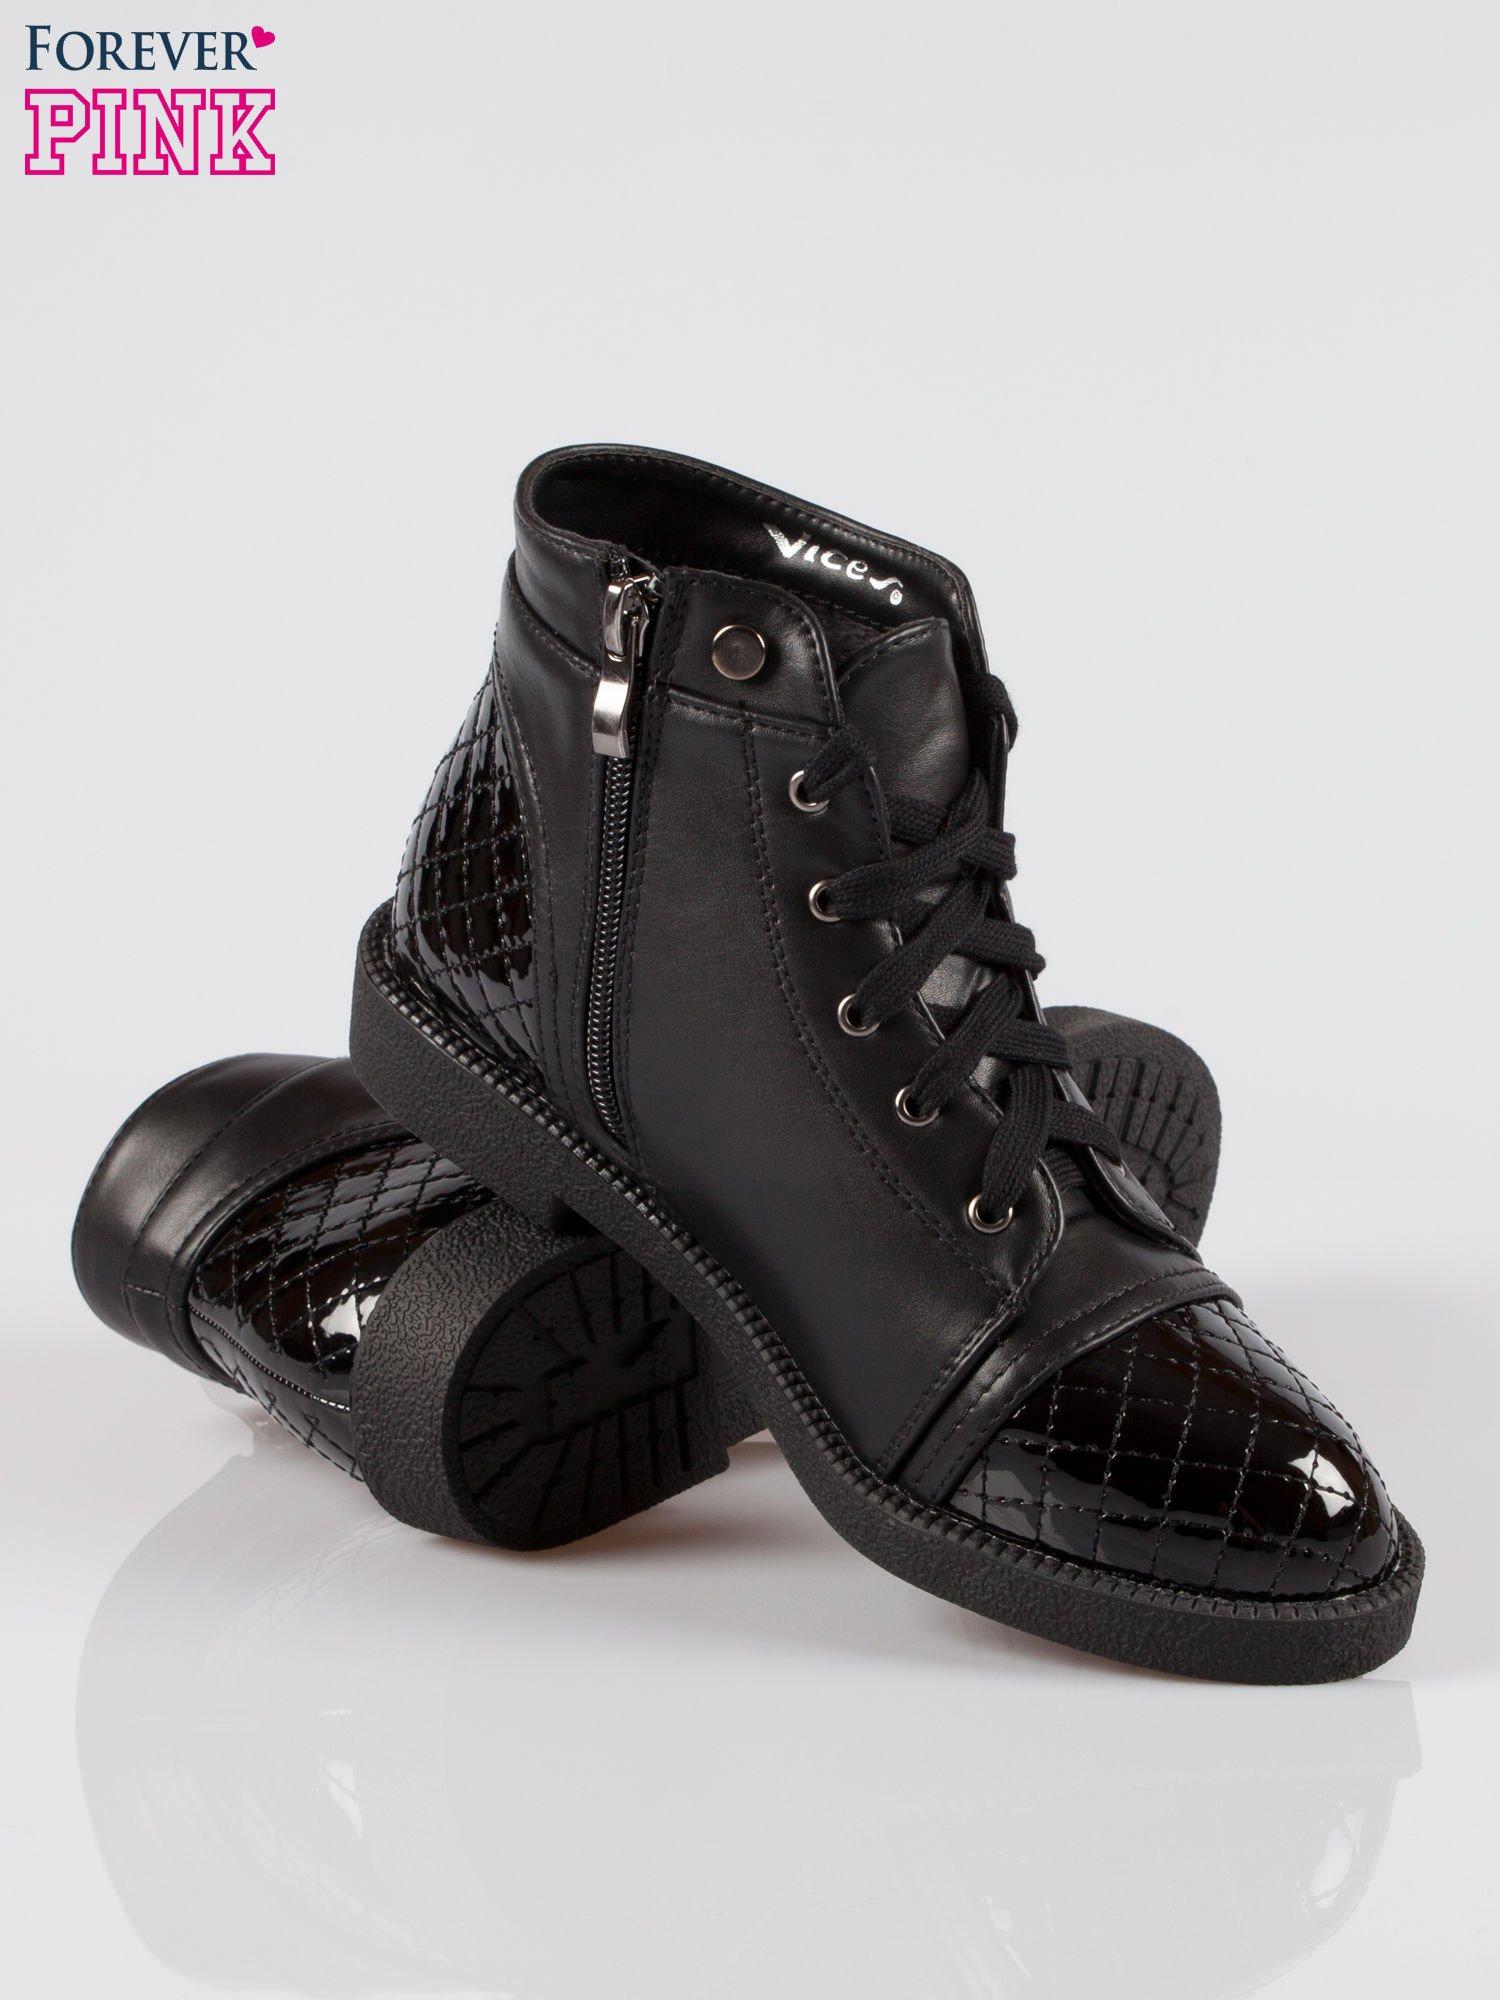 Czarne sznurowane botki damskie crocodile skin cap toe                                  zdj.                                  4